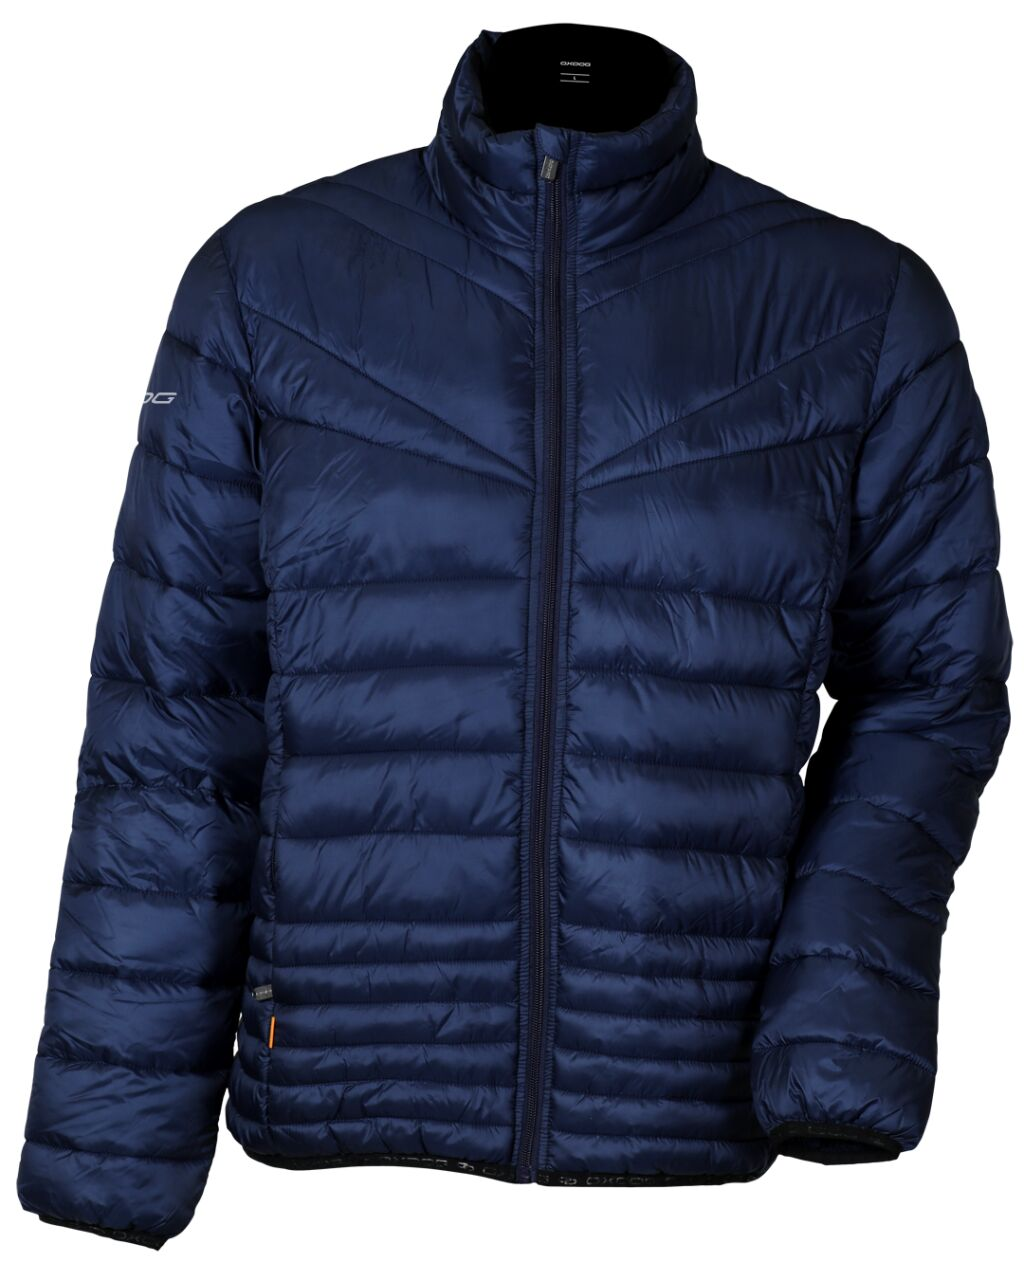 Oxdog Le Mans jacket